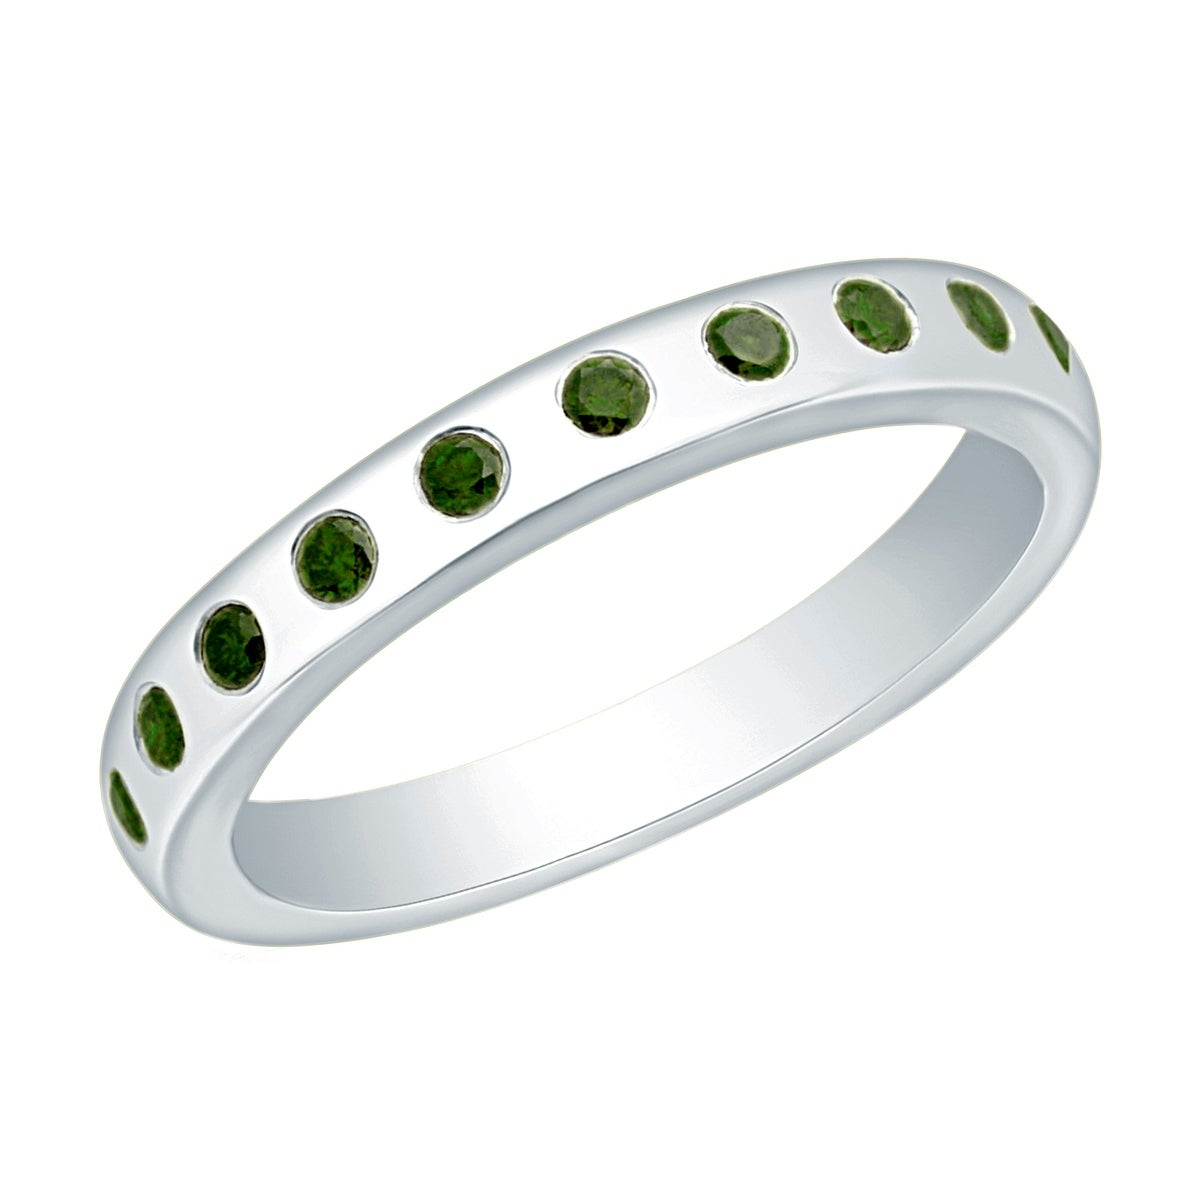 Prism Jewel 0 25ct Flush Set Round Cut Green Diamond Wedding Band Free Shipping Today 12496535